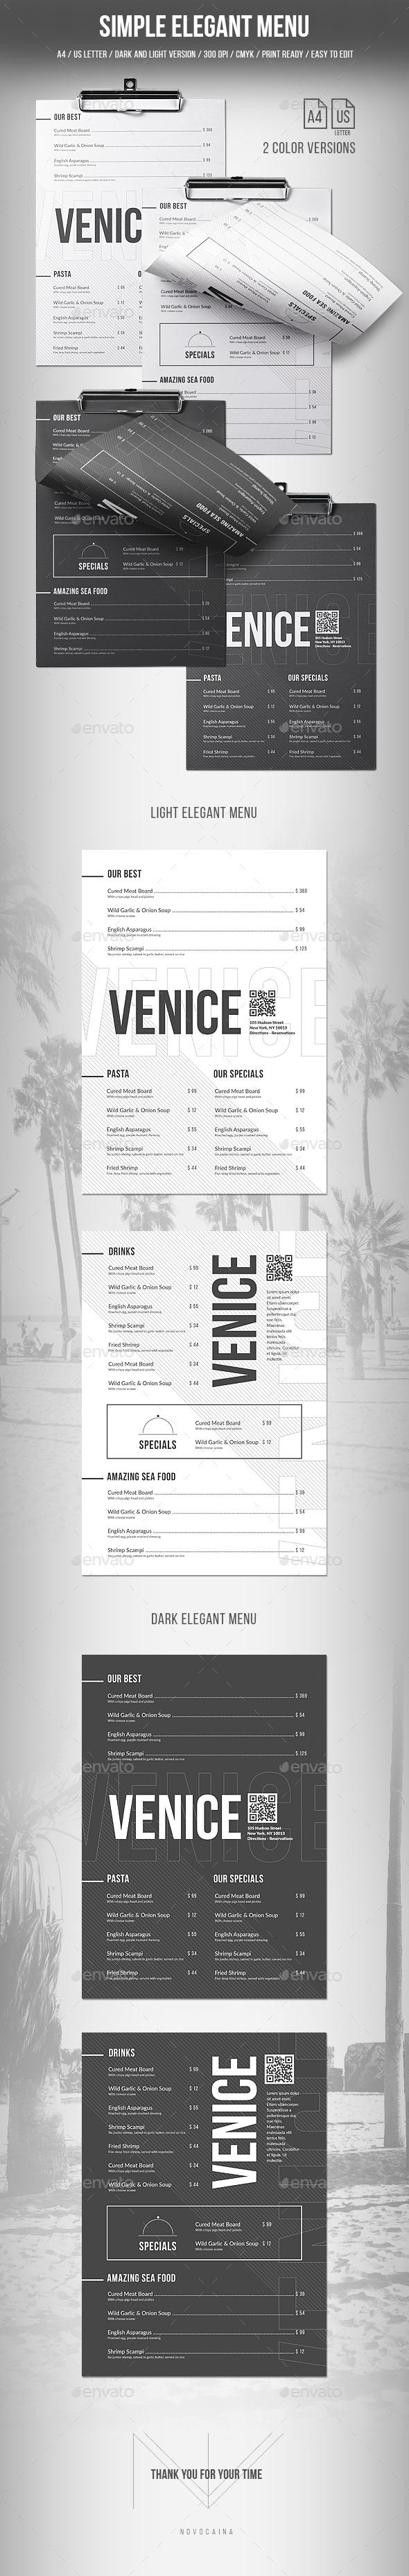 Simple Elegant Menu - A4 and US Letter - 2 Color Versions - Food Menus Print Templates